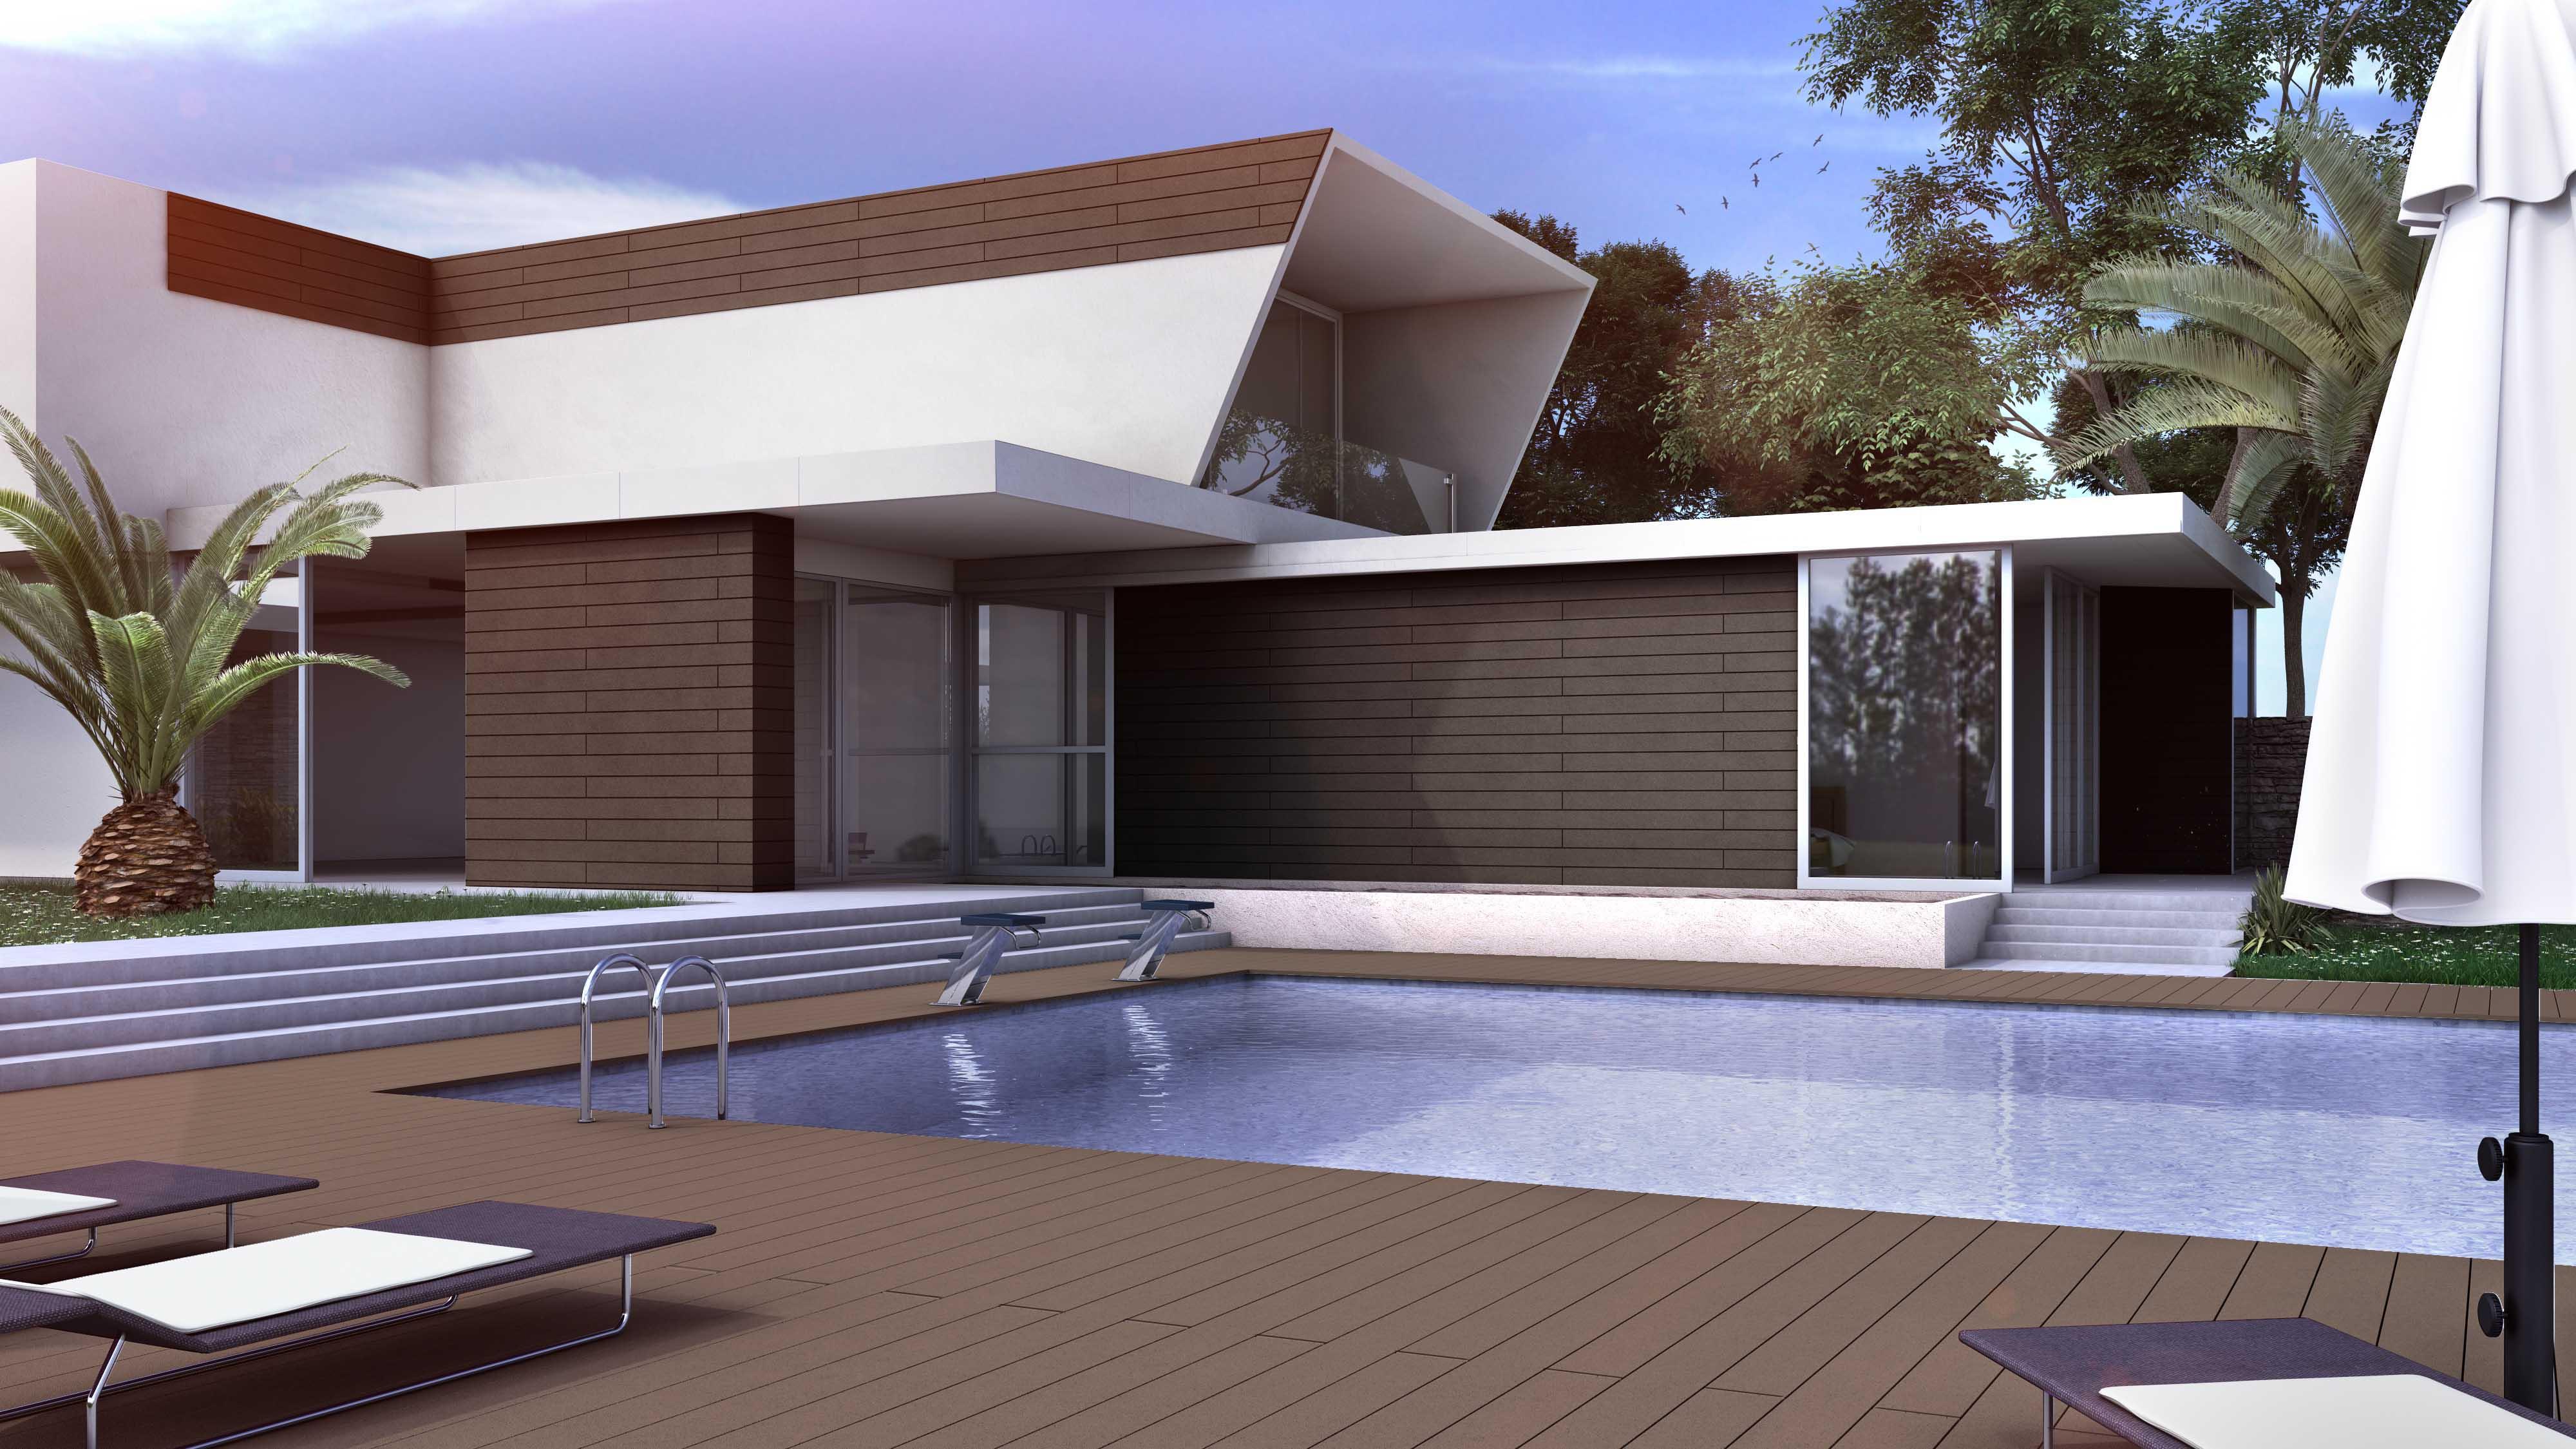 Decksystem tarima tecnol gica suelos composite para - Suelos de exterior antideslizantes ...